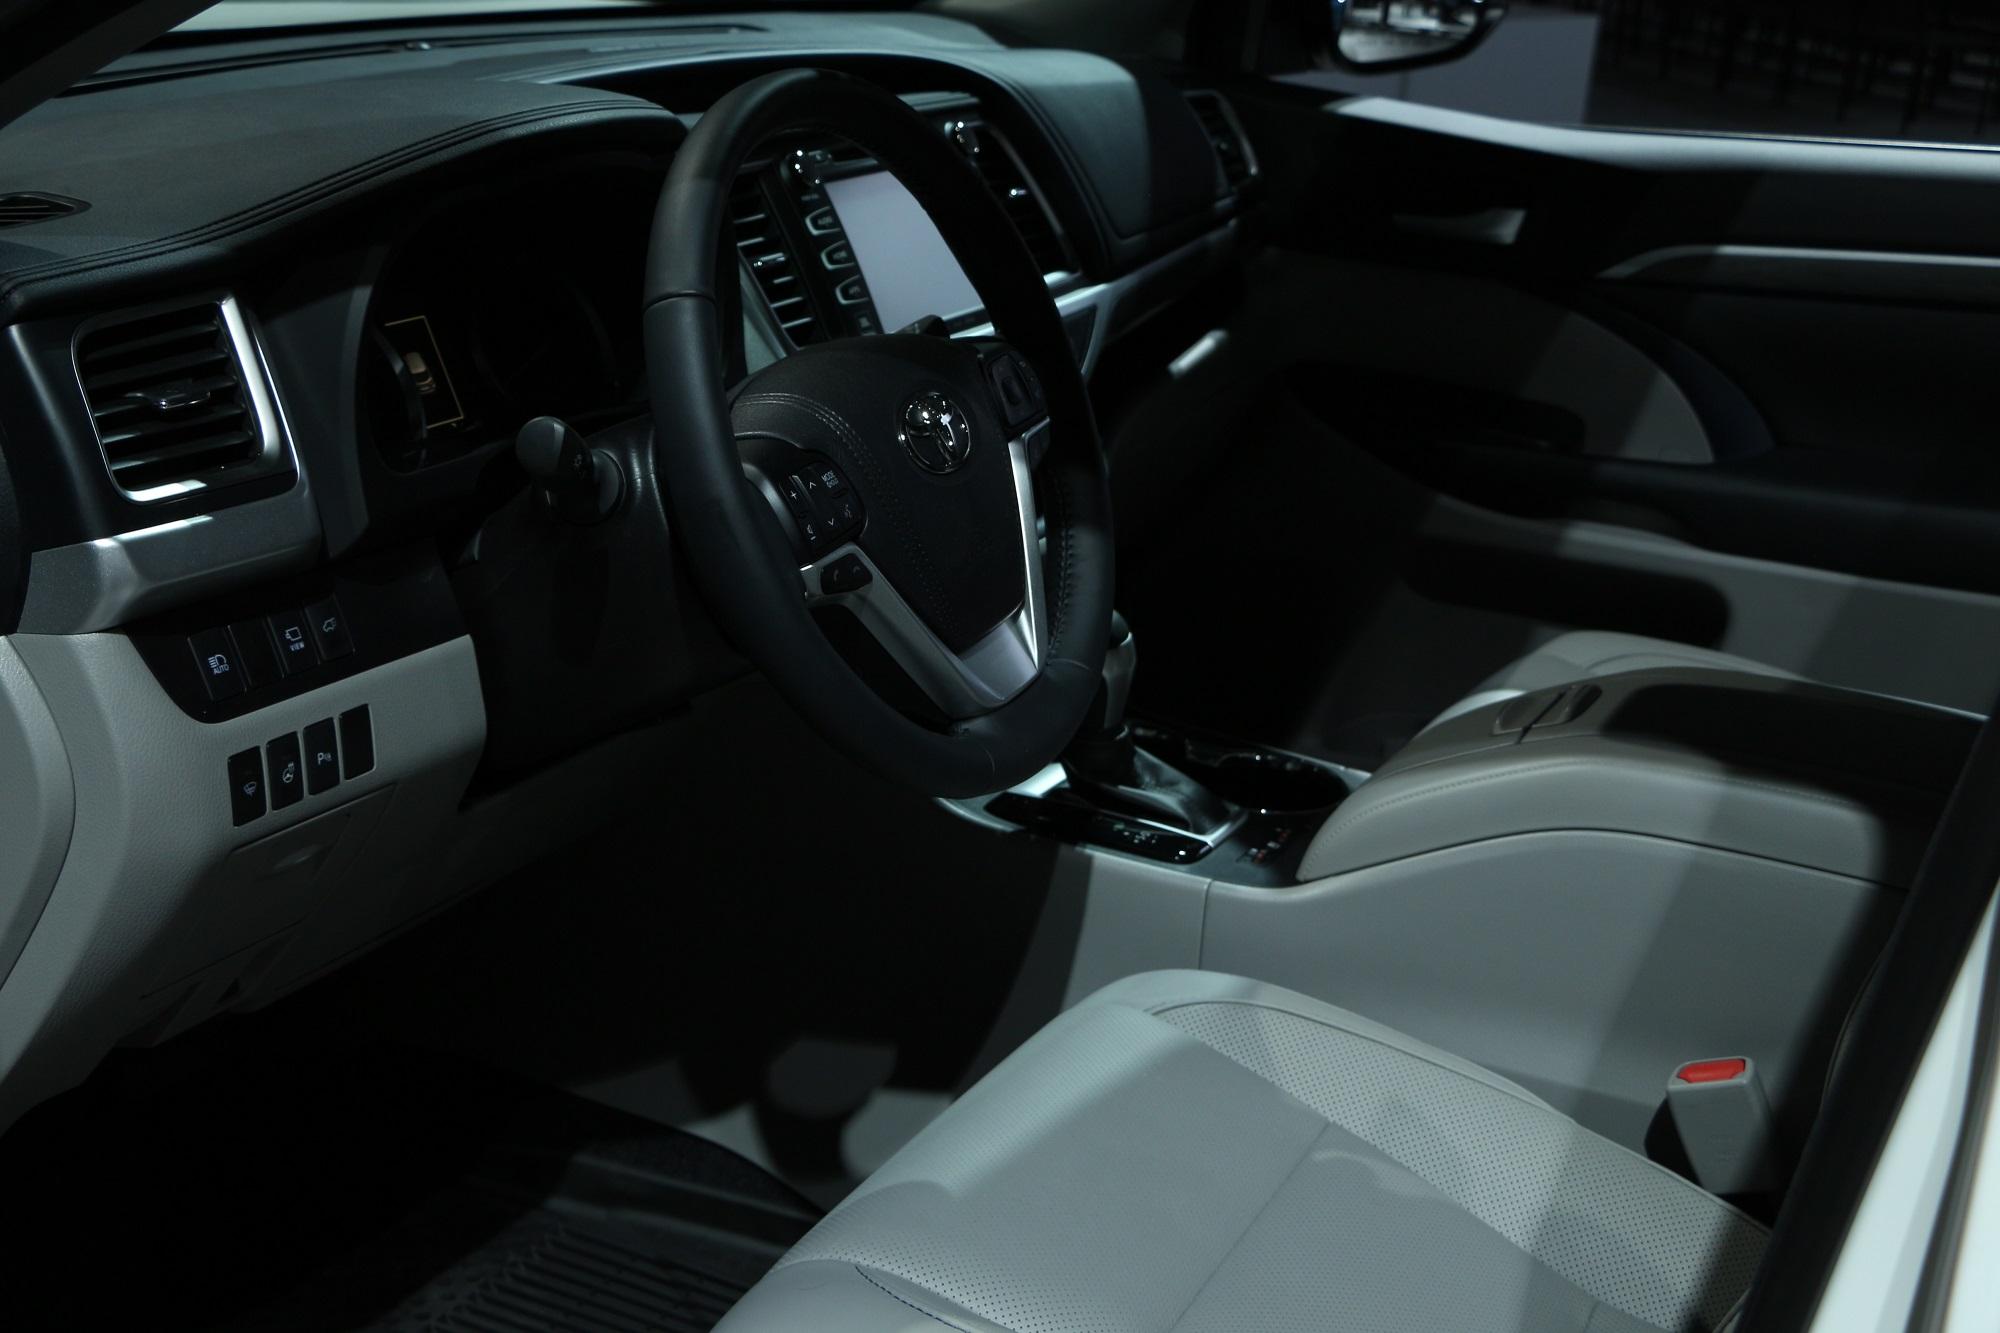 Scionlife.com Toyota 2017 2018 LA Los Angeles Auto Show Highlander Hybrid Sienna RAV4 4Runner Tacoma Tundra Sequoia Land Cruiser